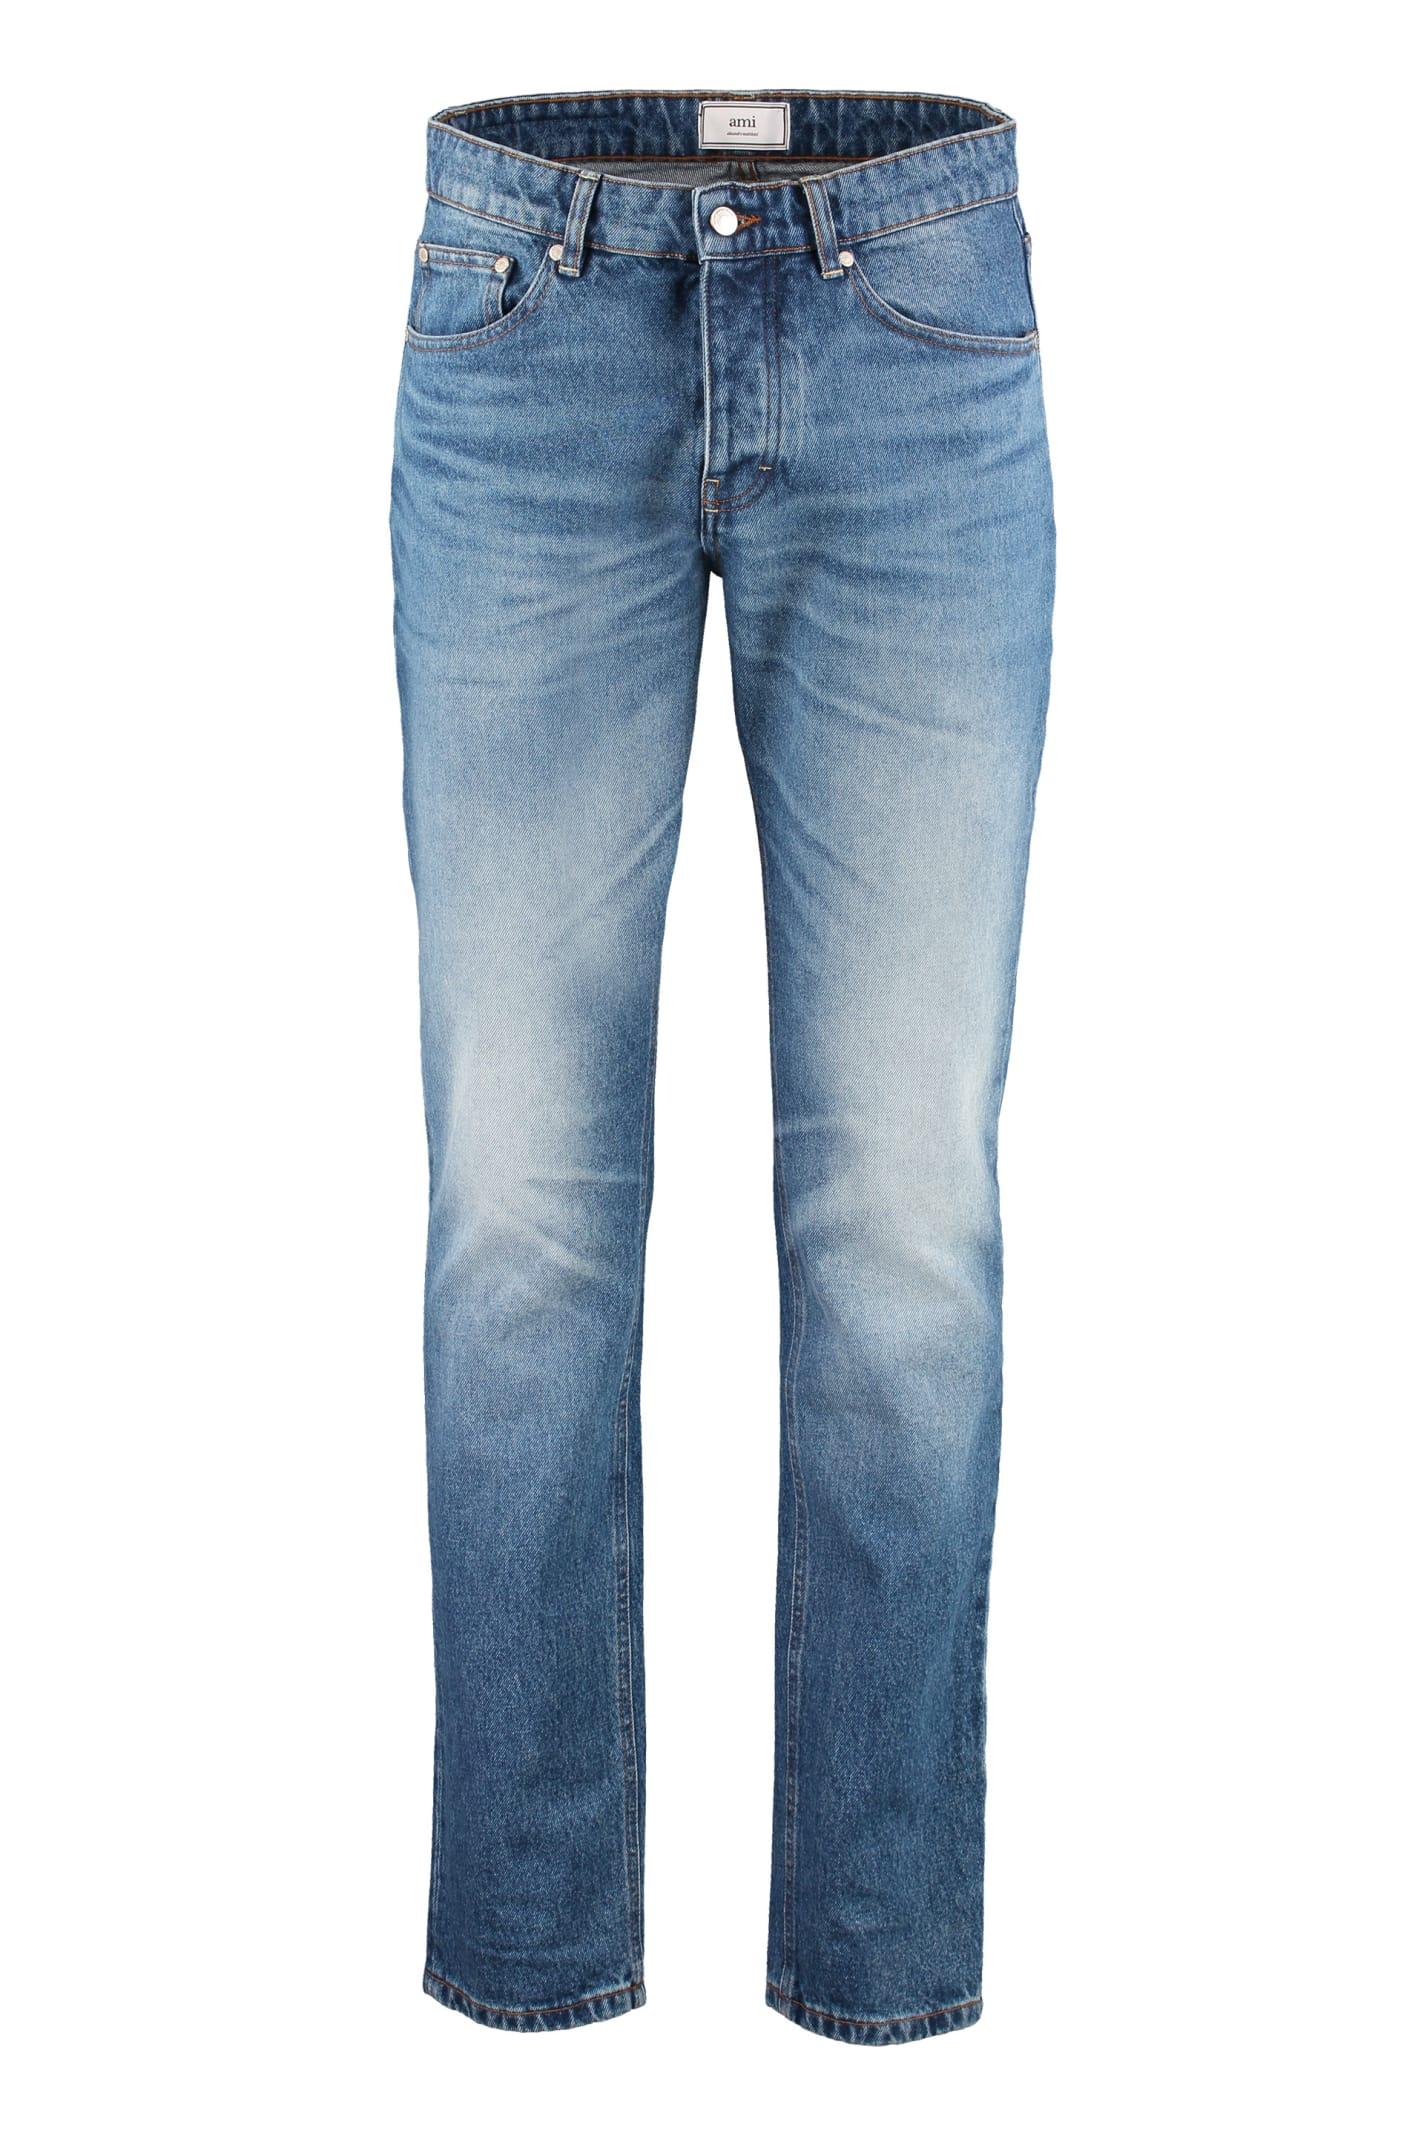 Ami Alexandre Mattiussi 5-pocket Straight-leg Jeans In Denim